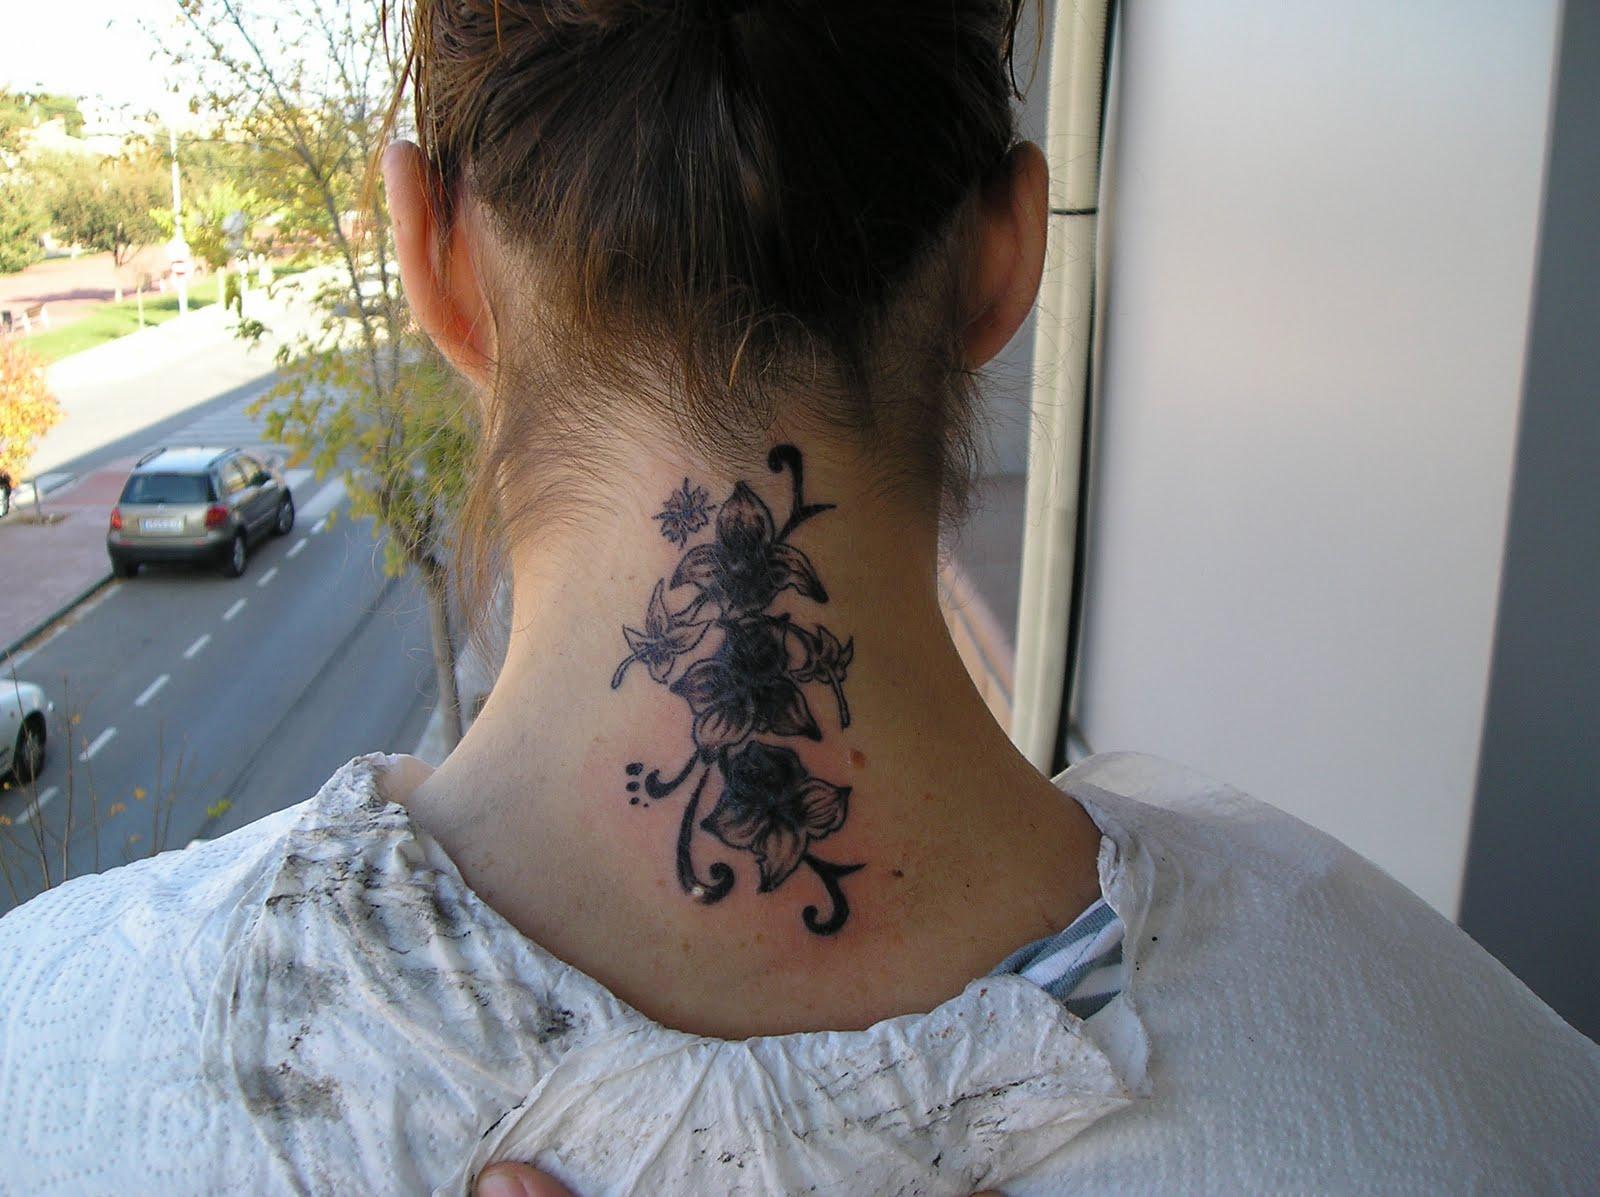 Pin exive s tattoo cover de flores y enredaderas sombras - Flores de sombra ...